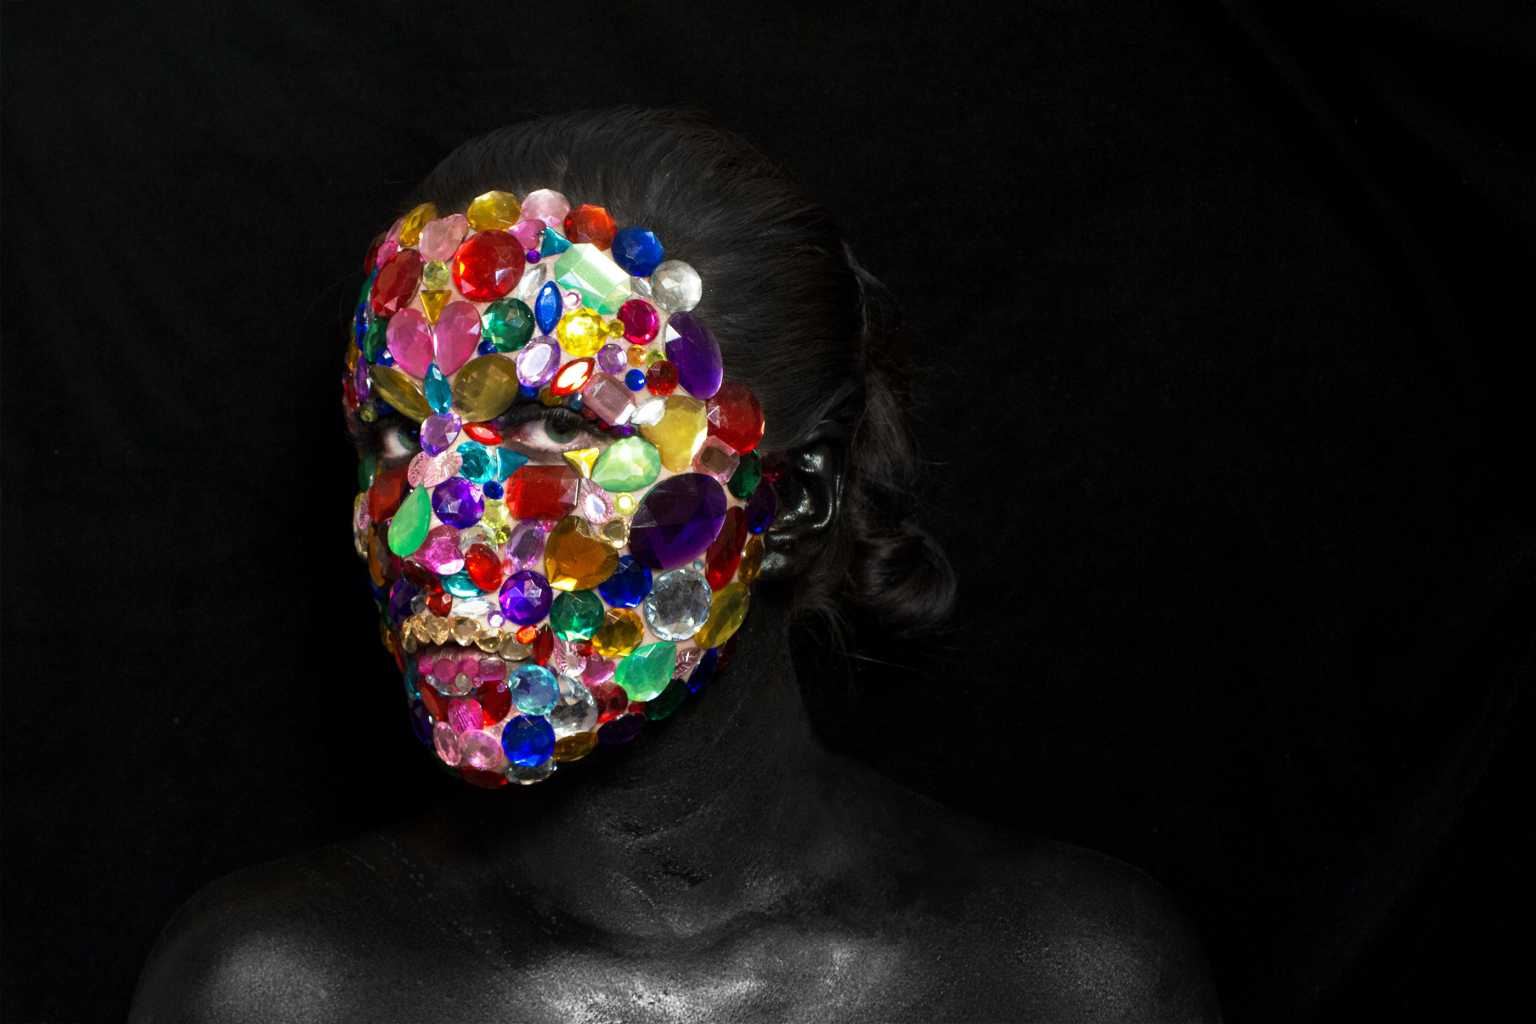 Digital Photographic Design Self Portrait Project